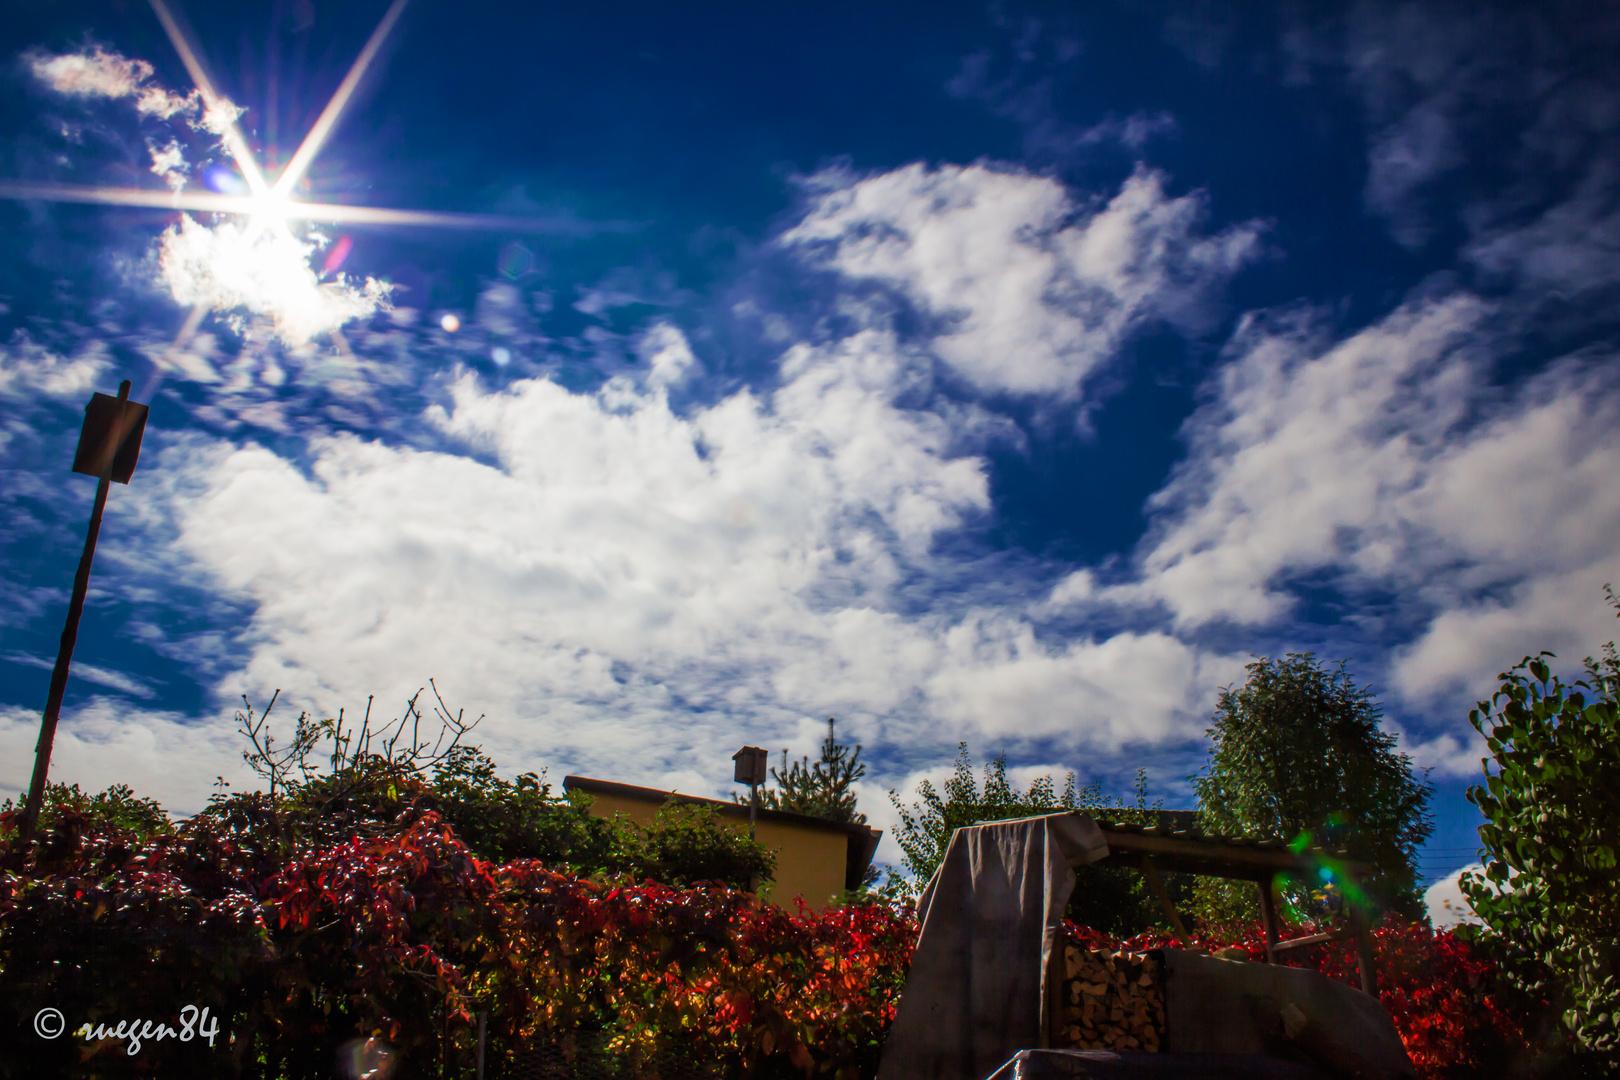 Himmelansicht aus dem Garten